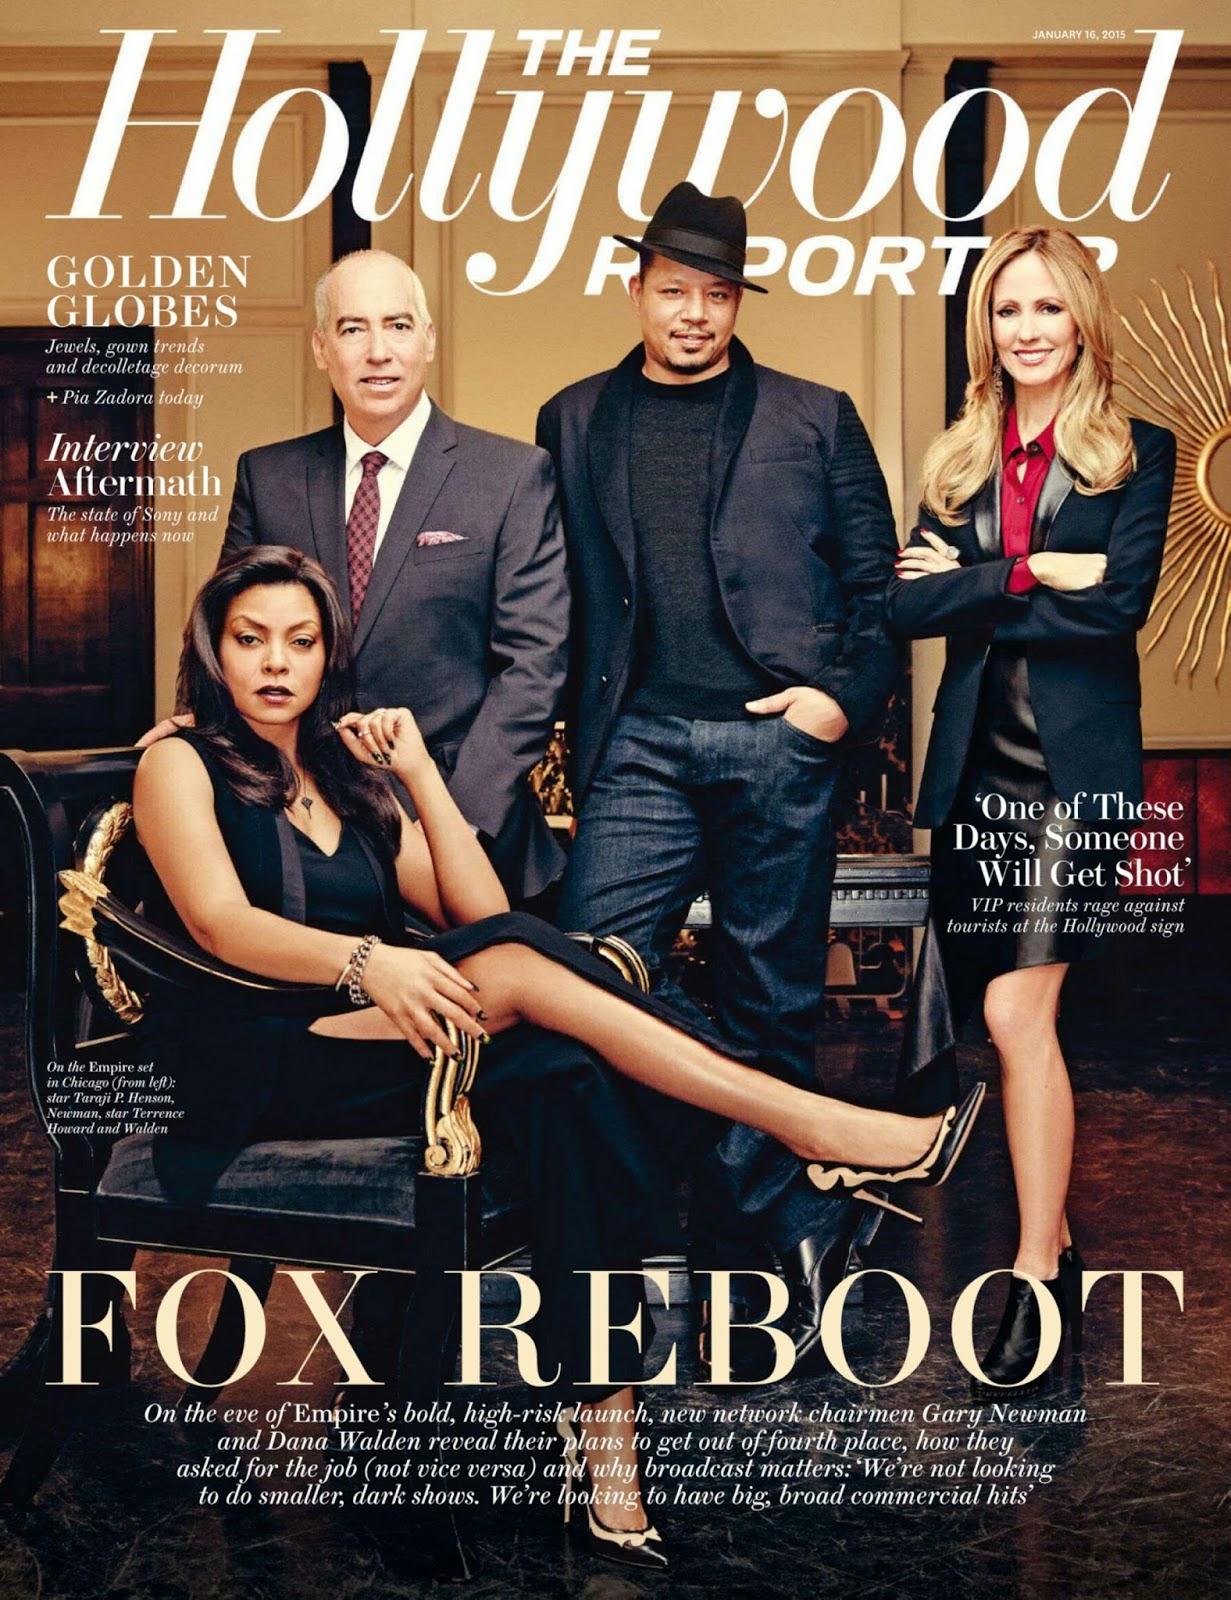 Taraji P Henson - The Hollywood Reporter, USA, January 2015